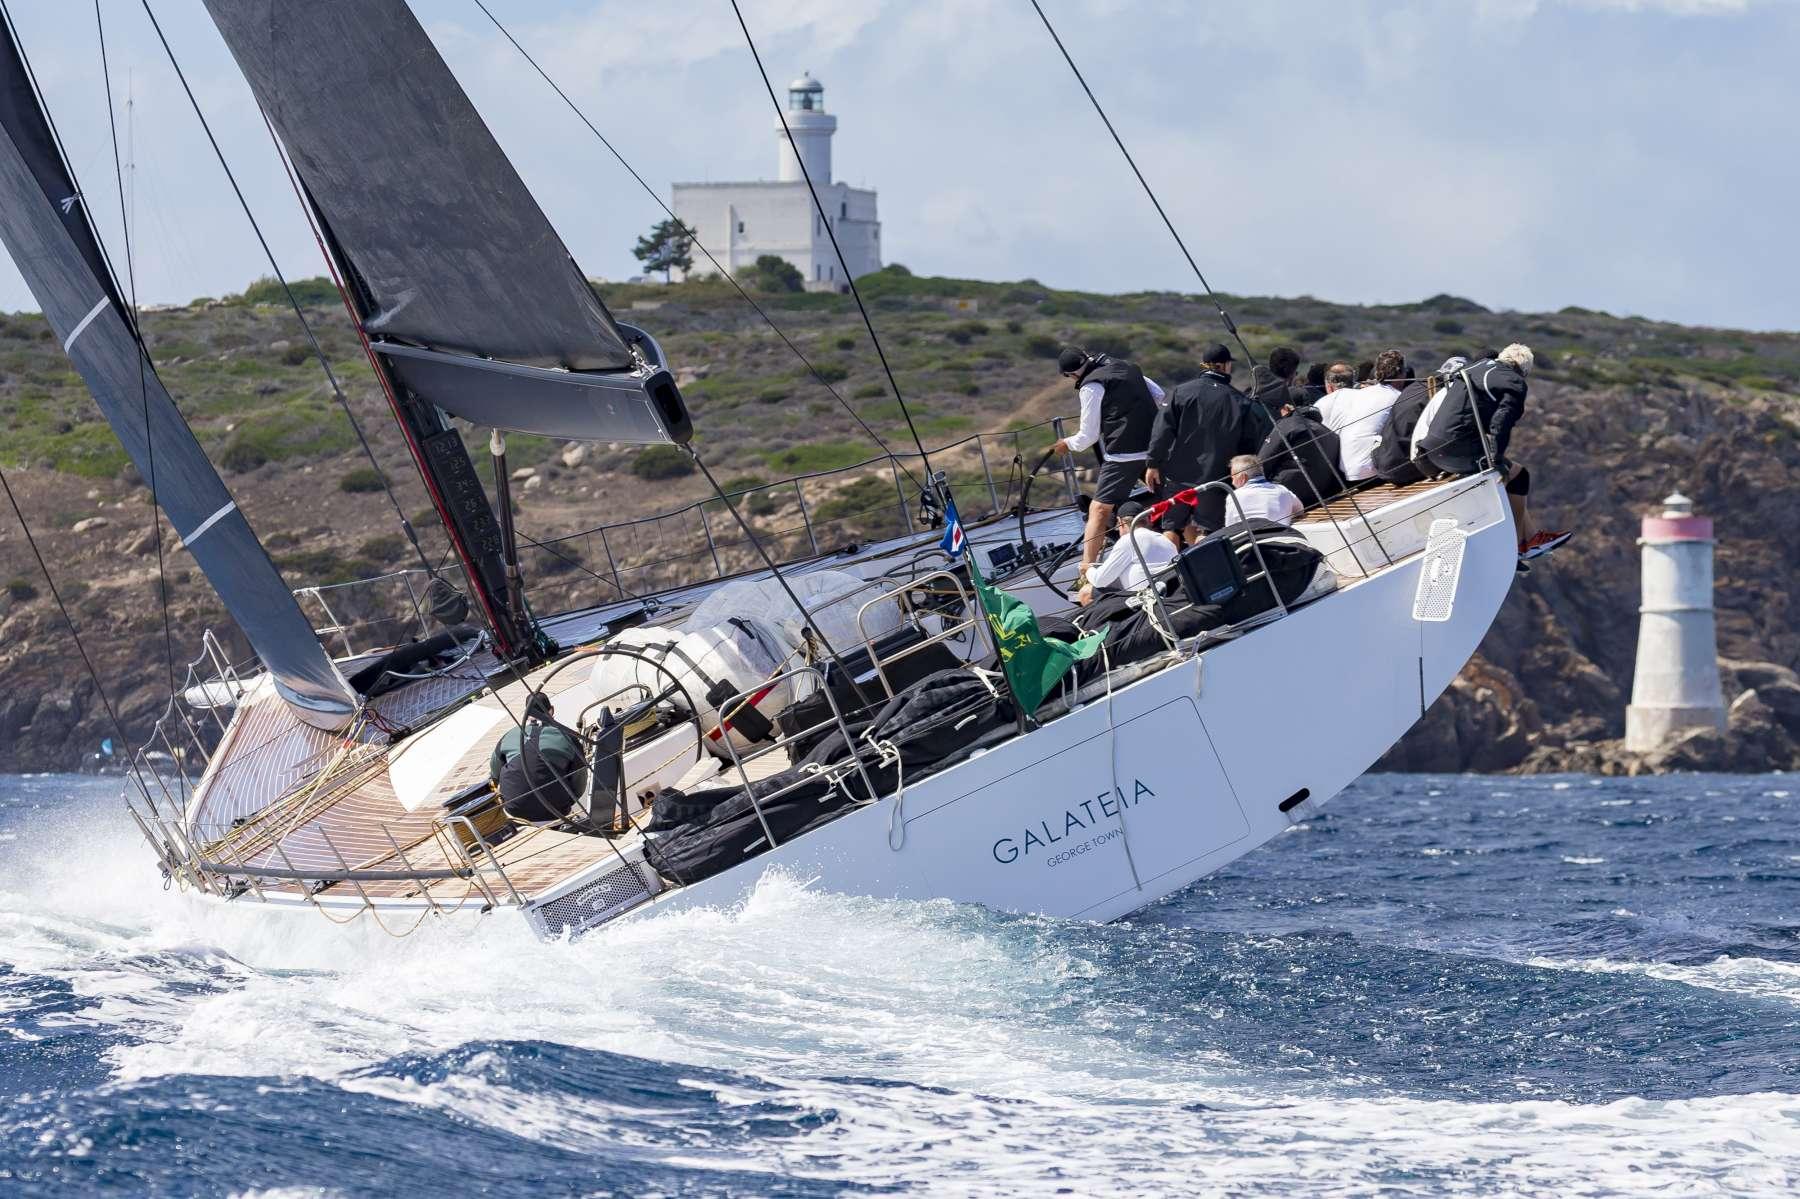 MAXI YACHT ROLEX CUP 2019 - FOTO DAY 4 ONLINE - NEWS - Yacht Club Costa Smeralda